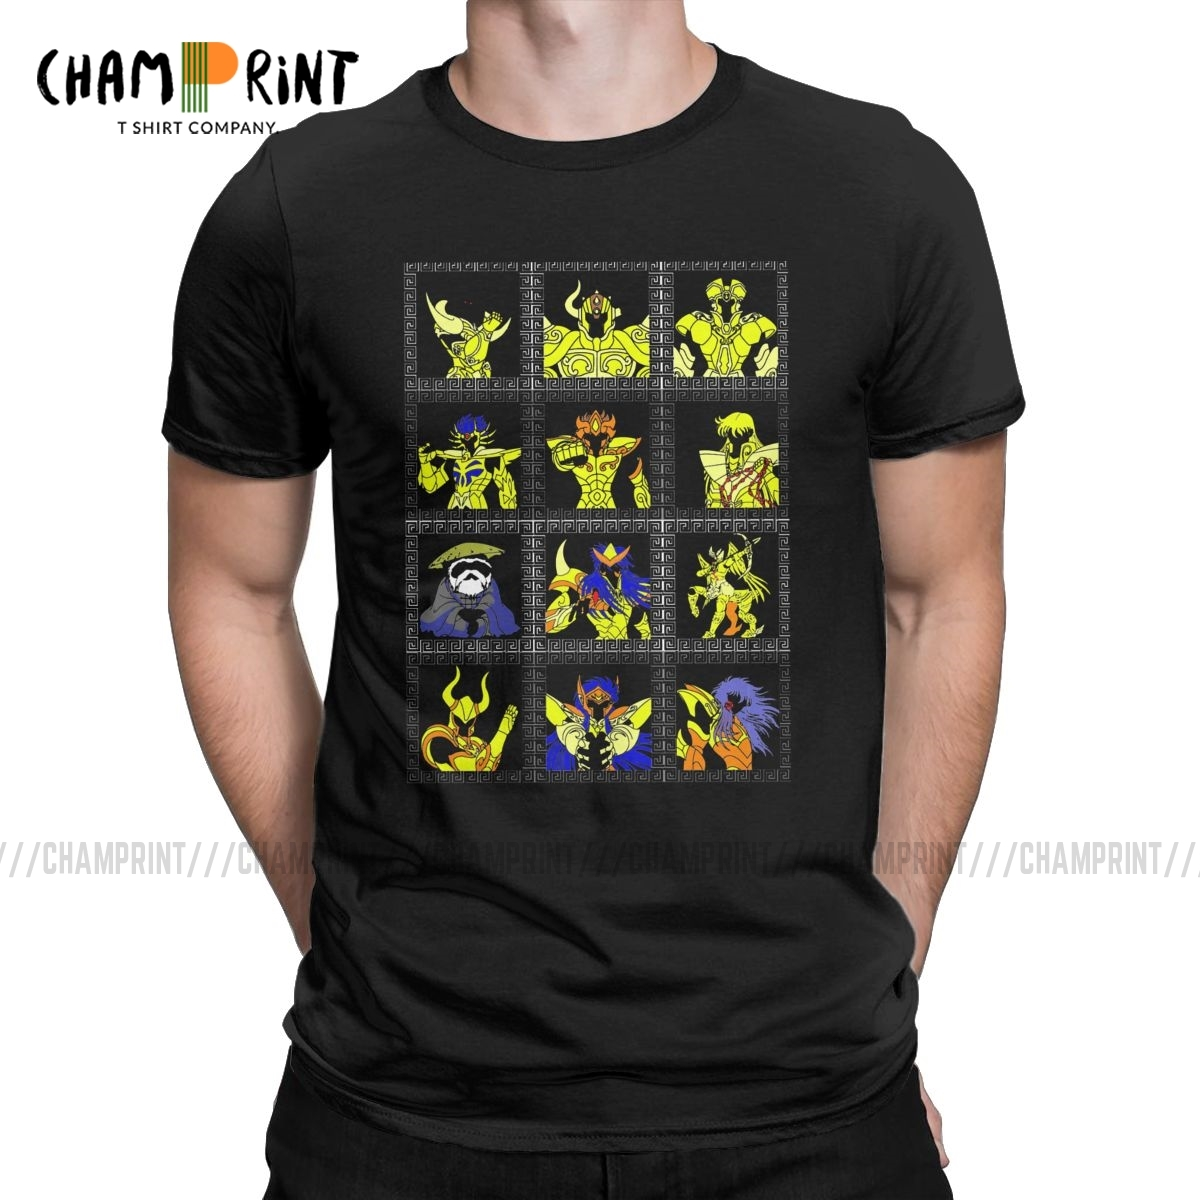 Men's T-Shirt Classic Gold Saints Humor Tee Shirt Saint Seiya Knights Of The Zodiac Anime T Shirt Crewneck Clothes Plus Size